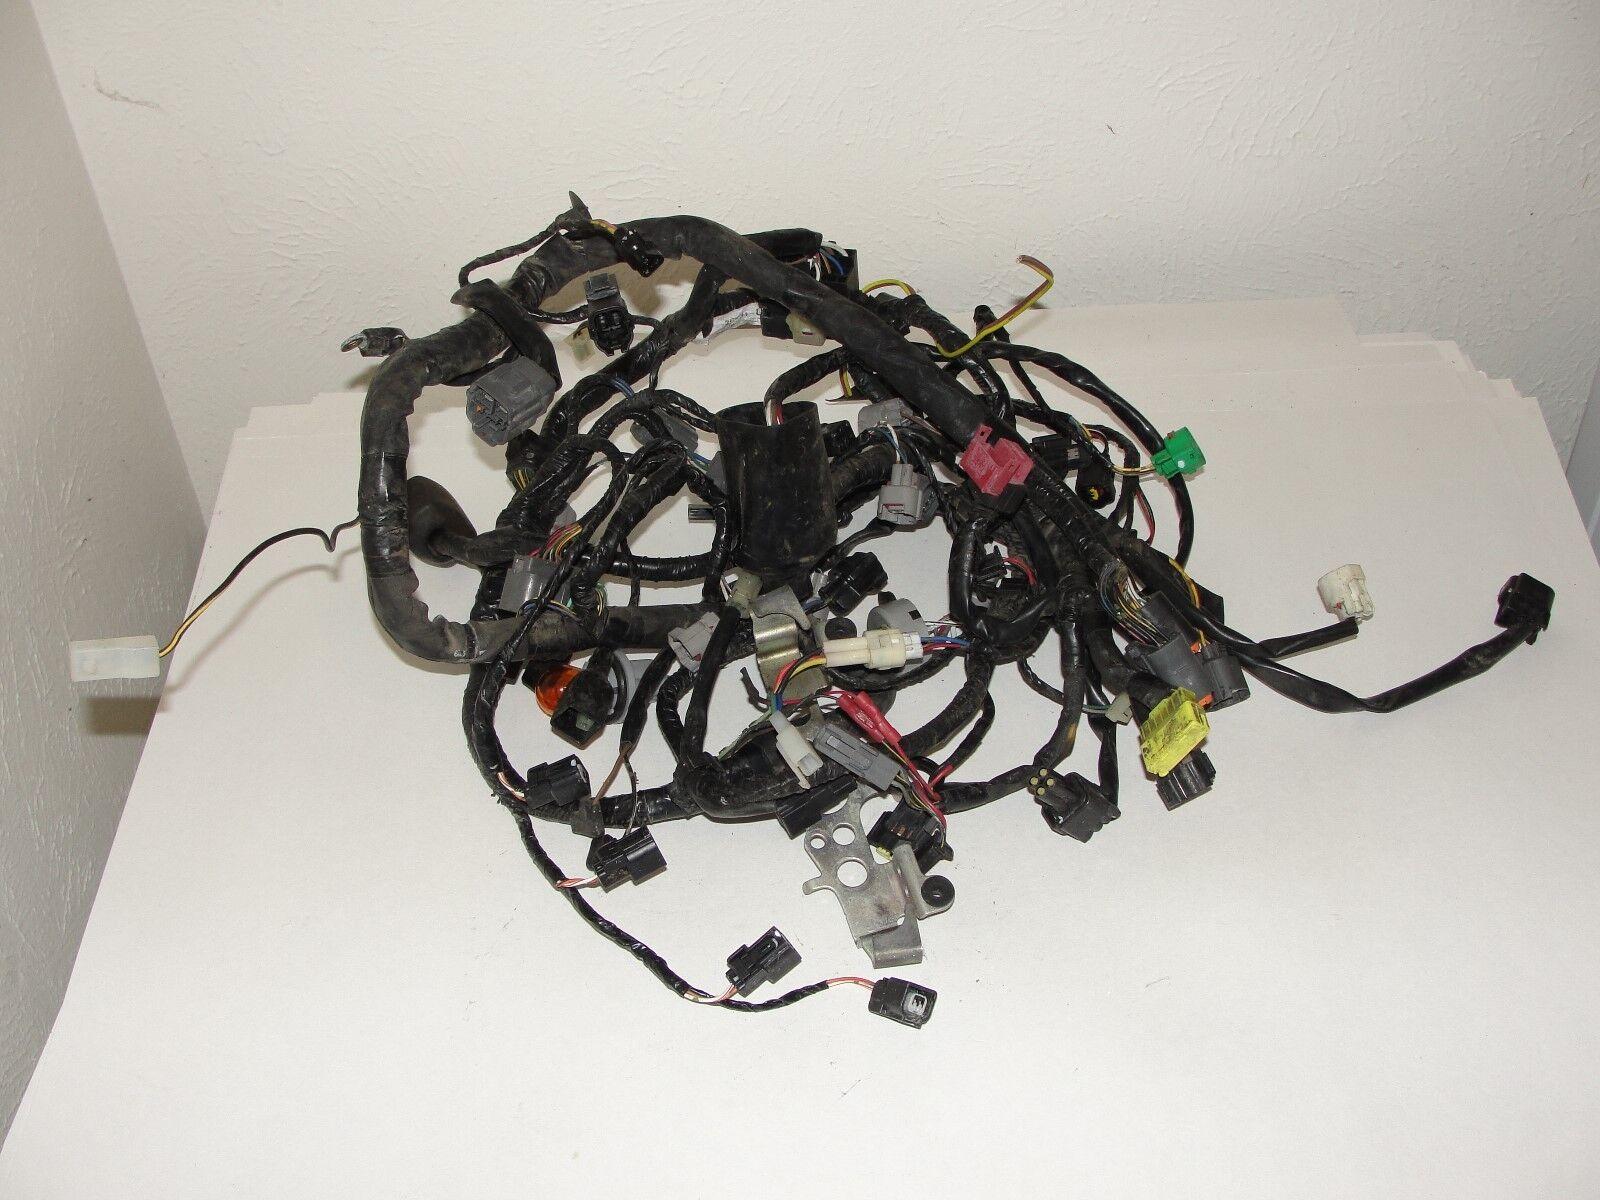 07 08 Kawasaki Zx600 Zx 600 Wiring Harness 26031 0561 Ebay Zx6r Norton Secured Powered By Verisign